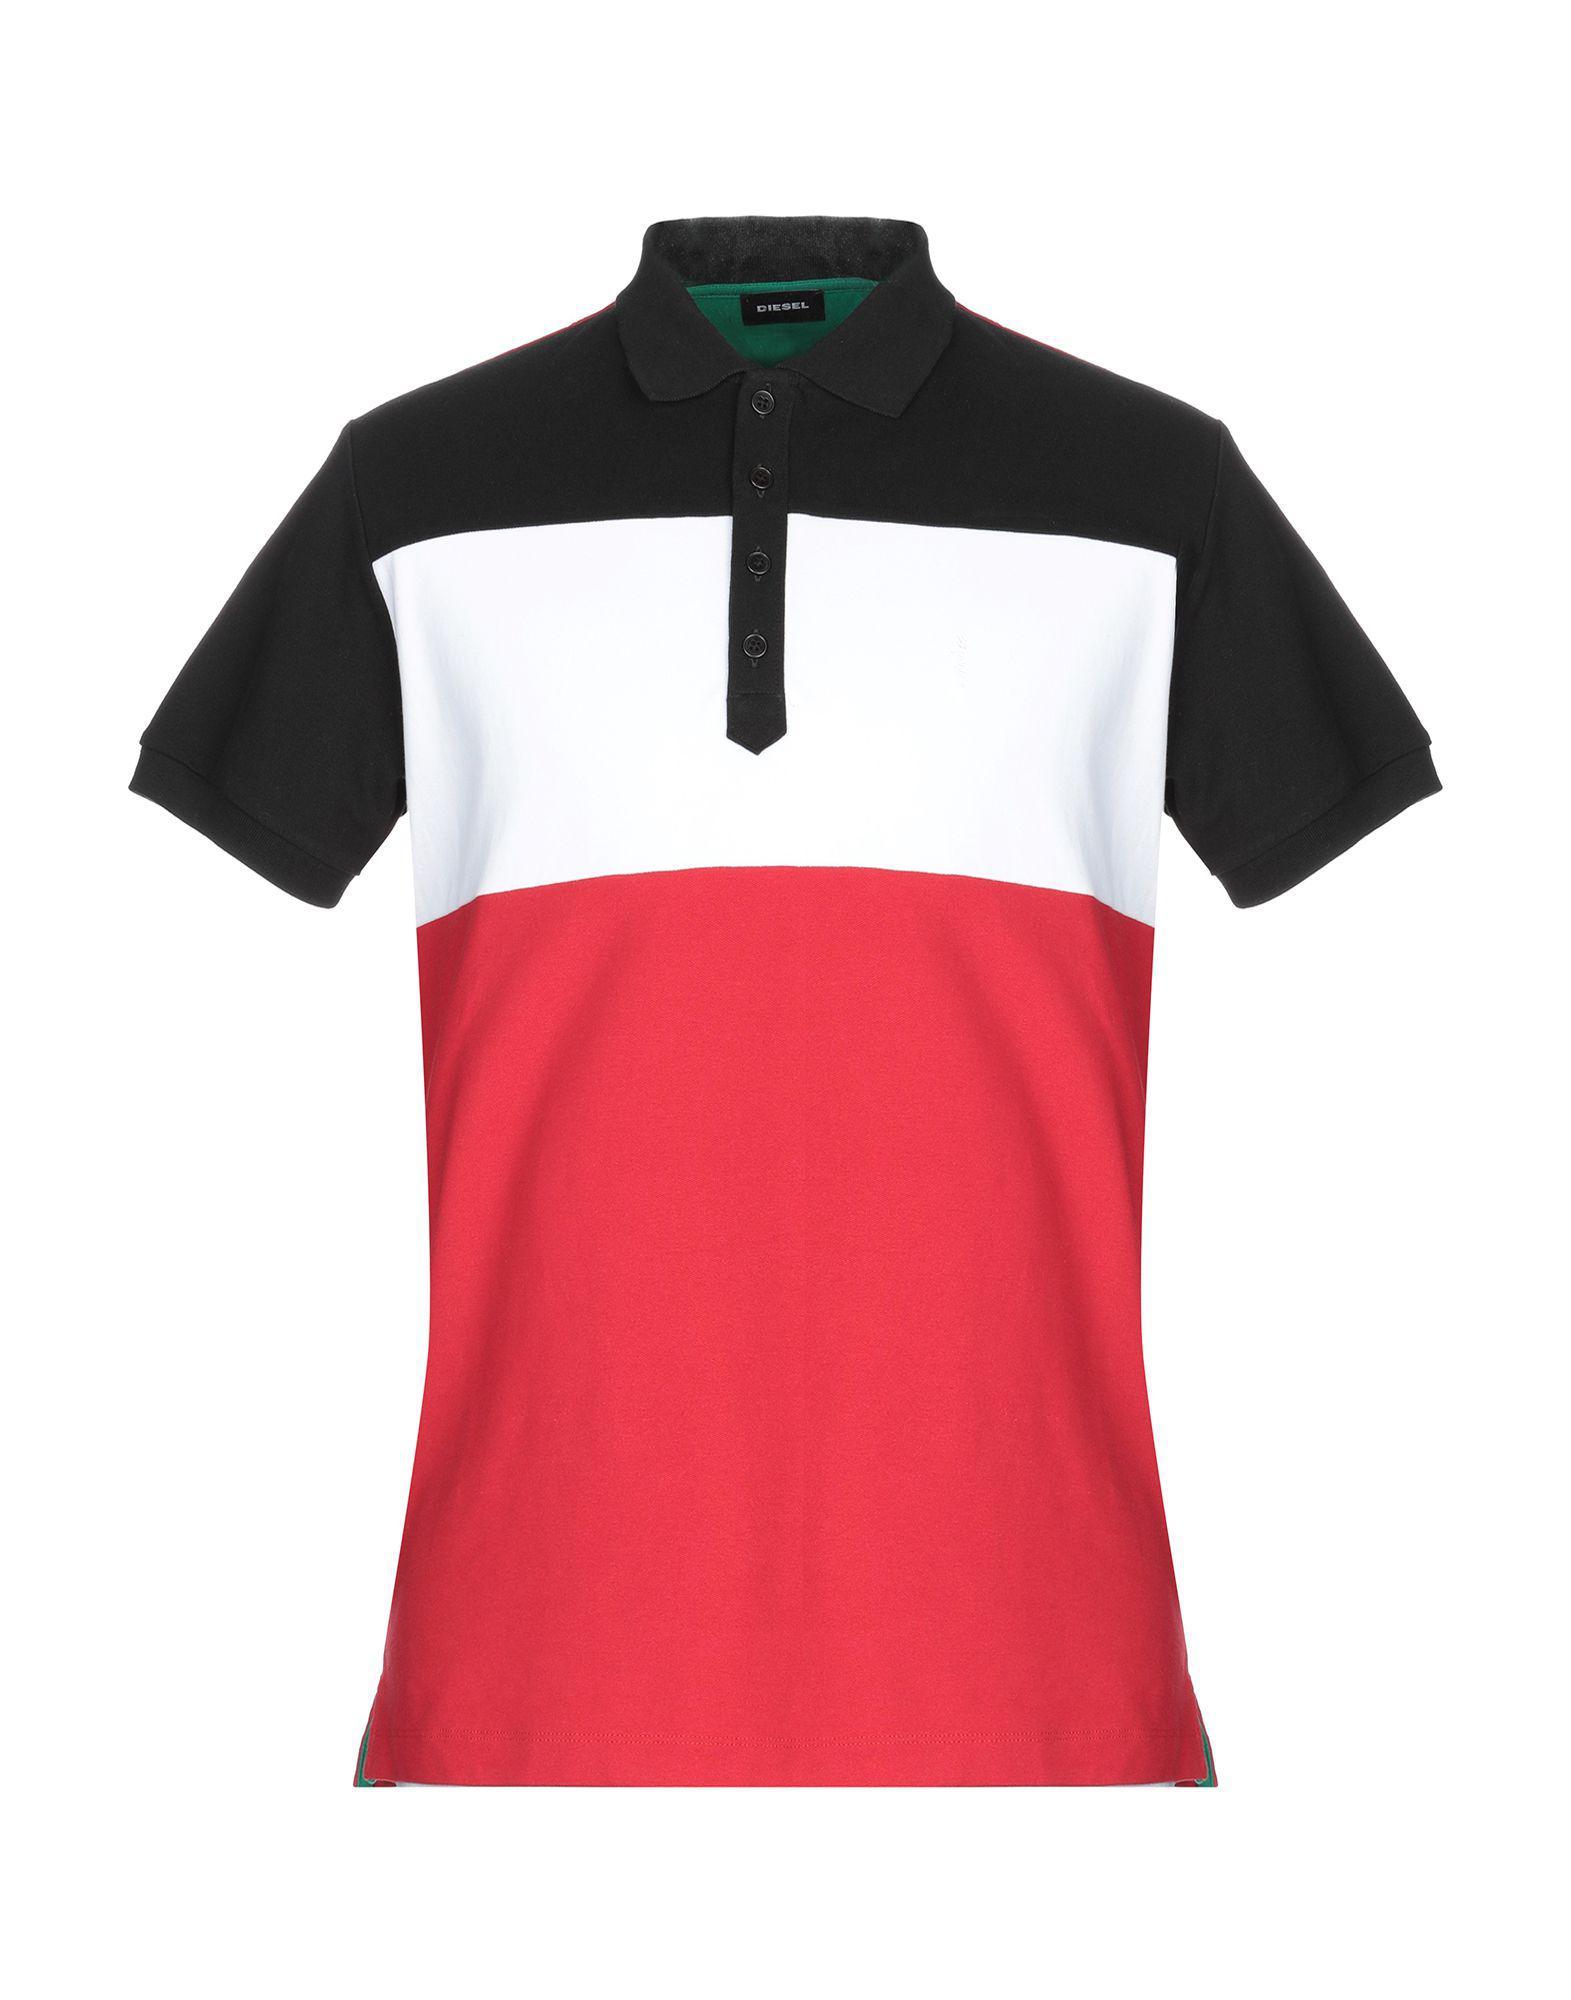 eca5ebab DIESEL - Red Polo Shirt for Men - Lyst. View fullscreen